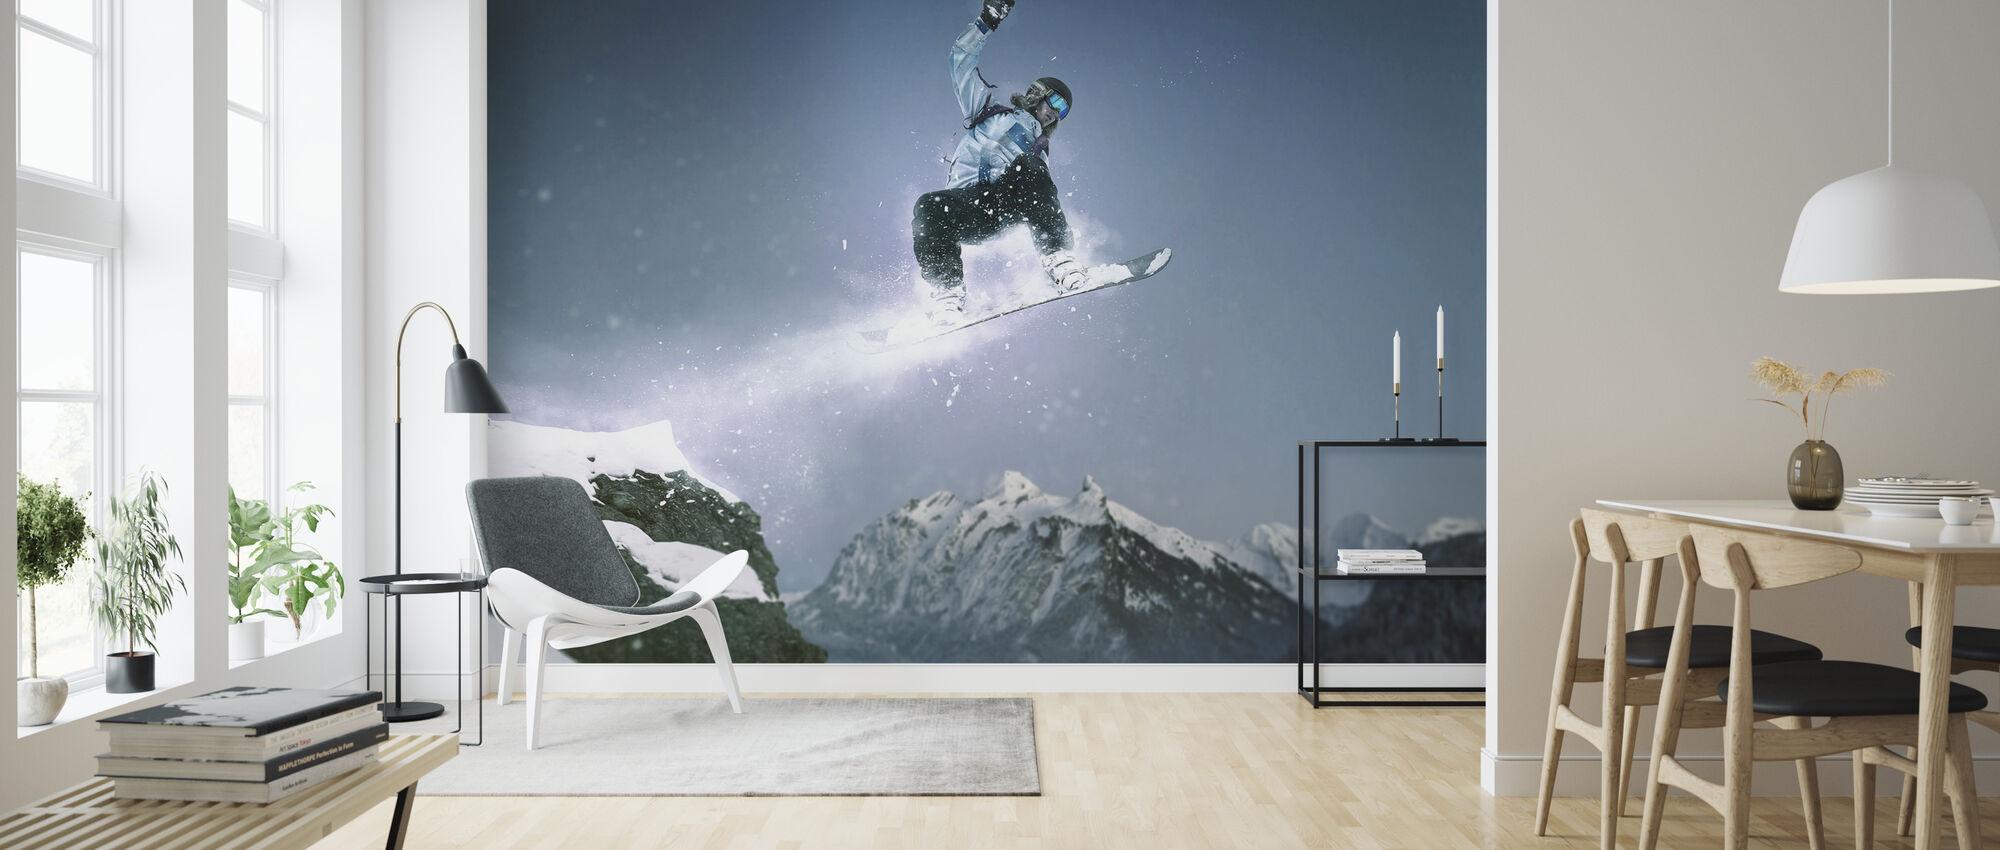 Snowboard Method Grab - Wallpaper - Living Room